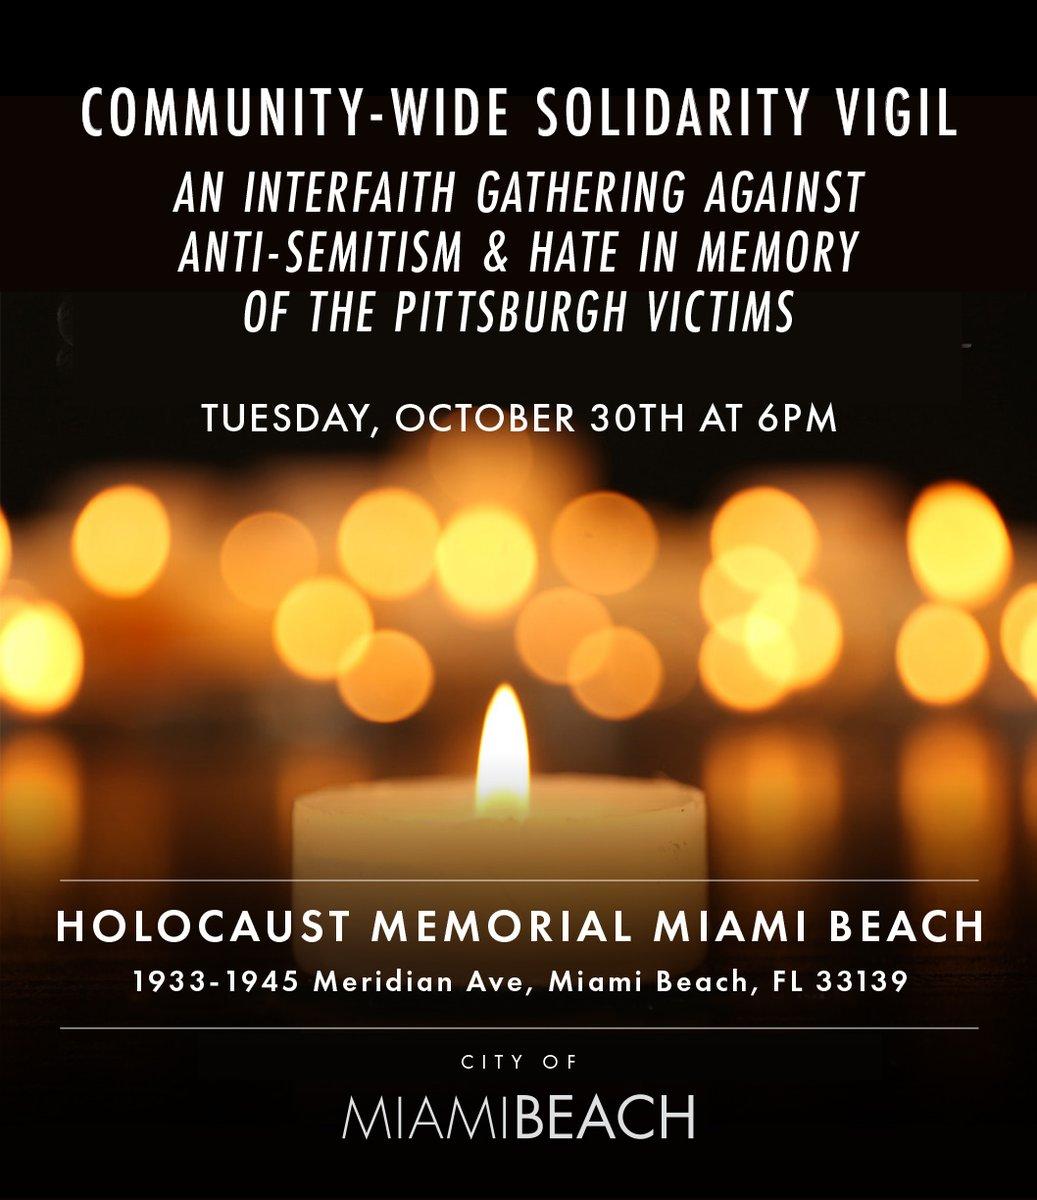 Miami Beach Solidarity Vigil to Honor Victims of the Pittsburgh Synagogue Mass Shooting